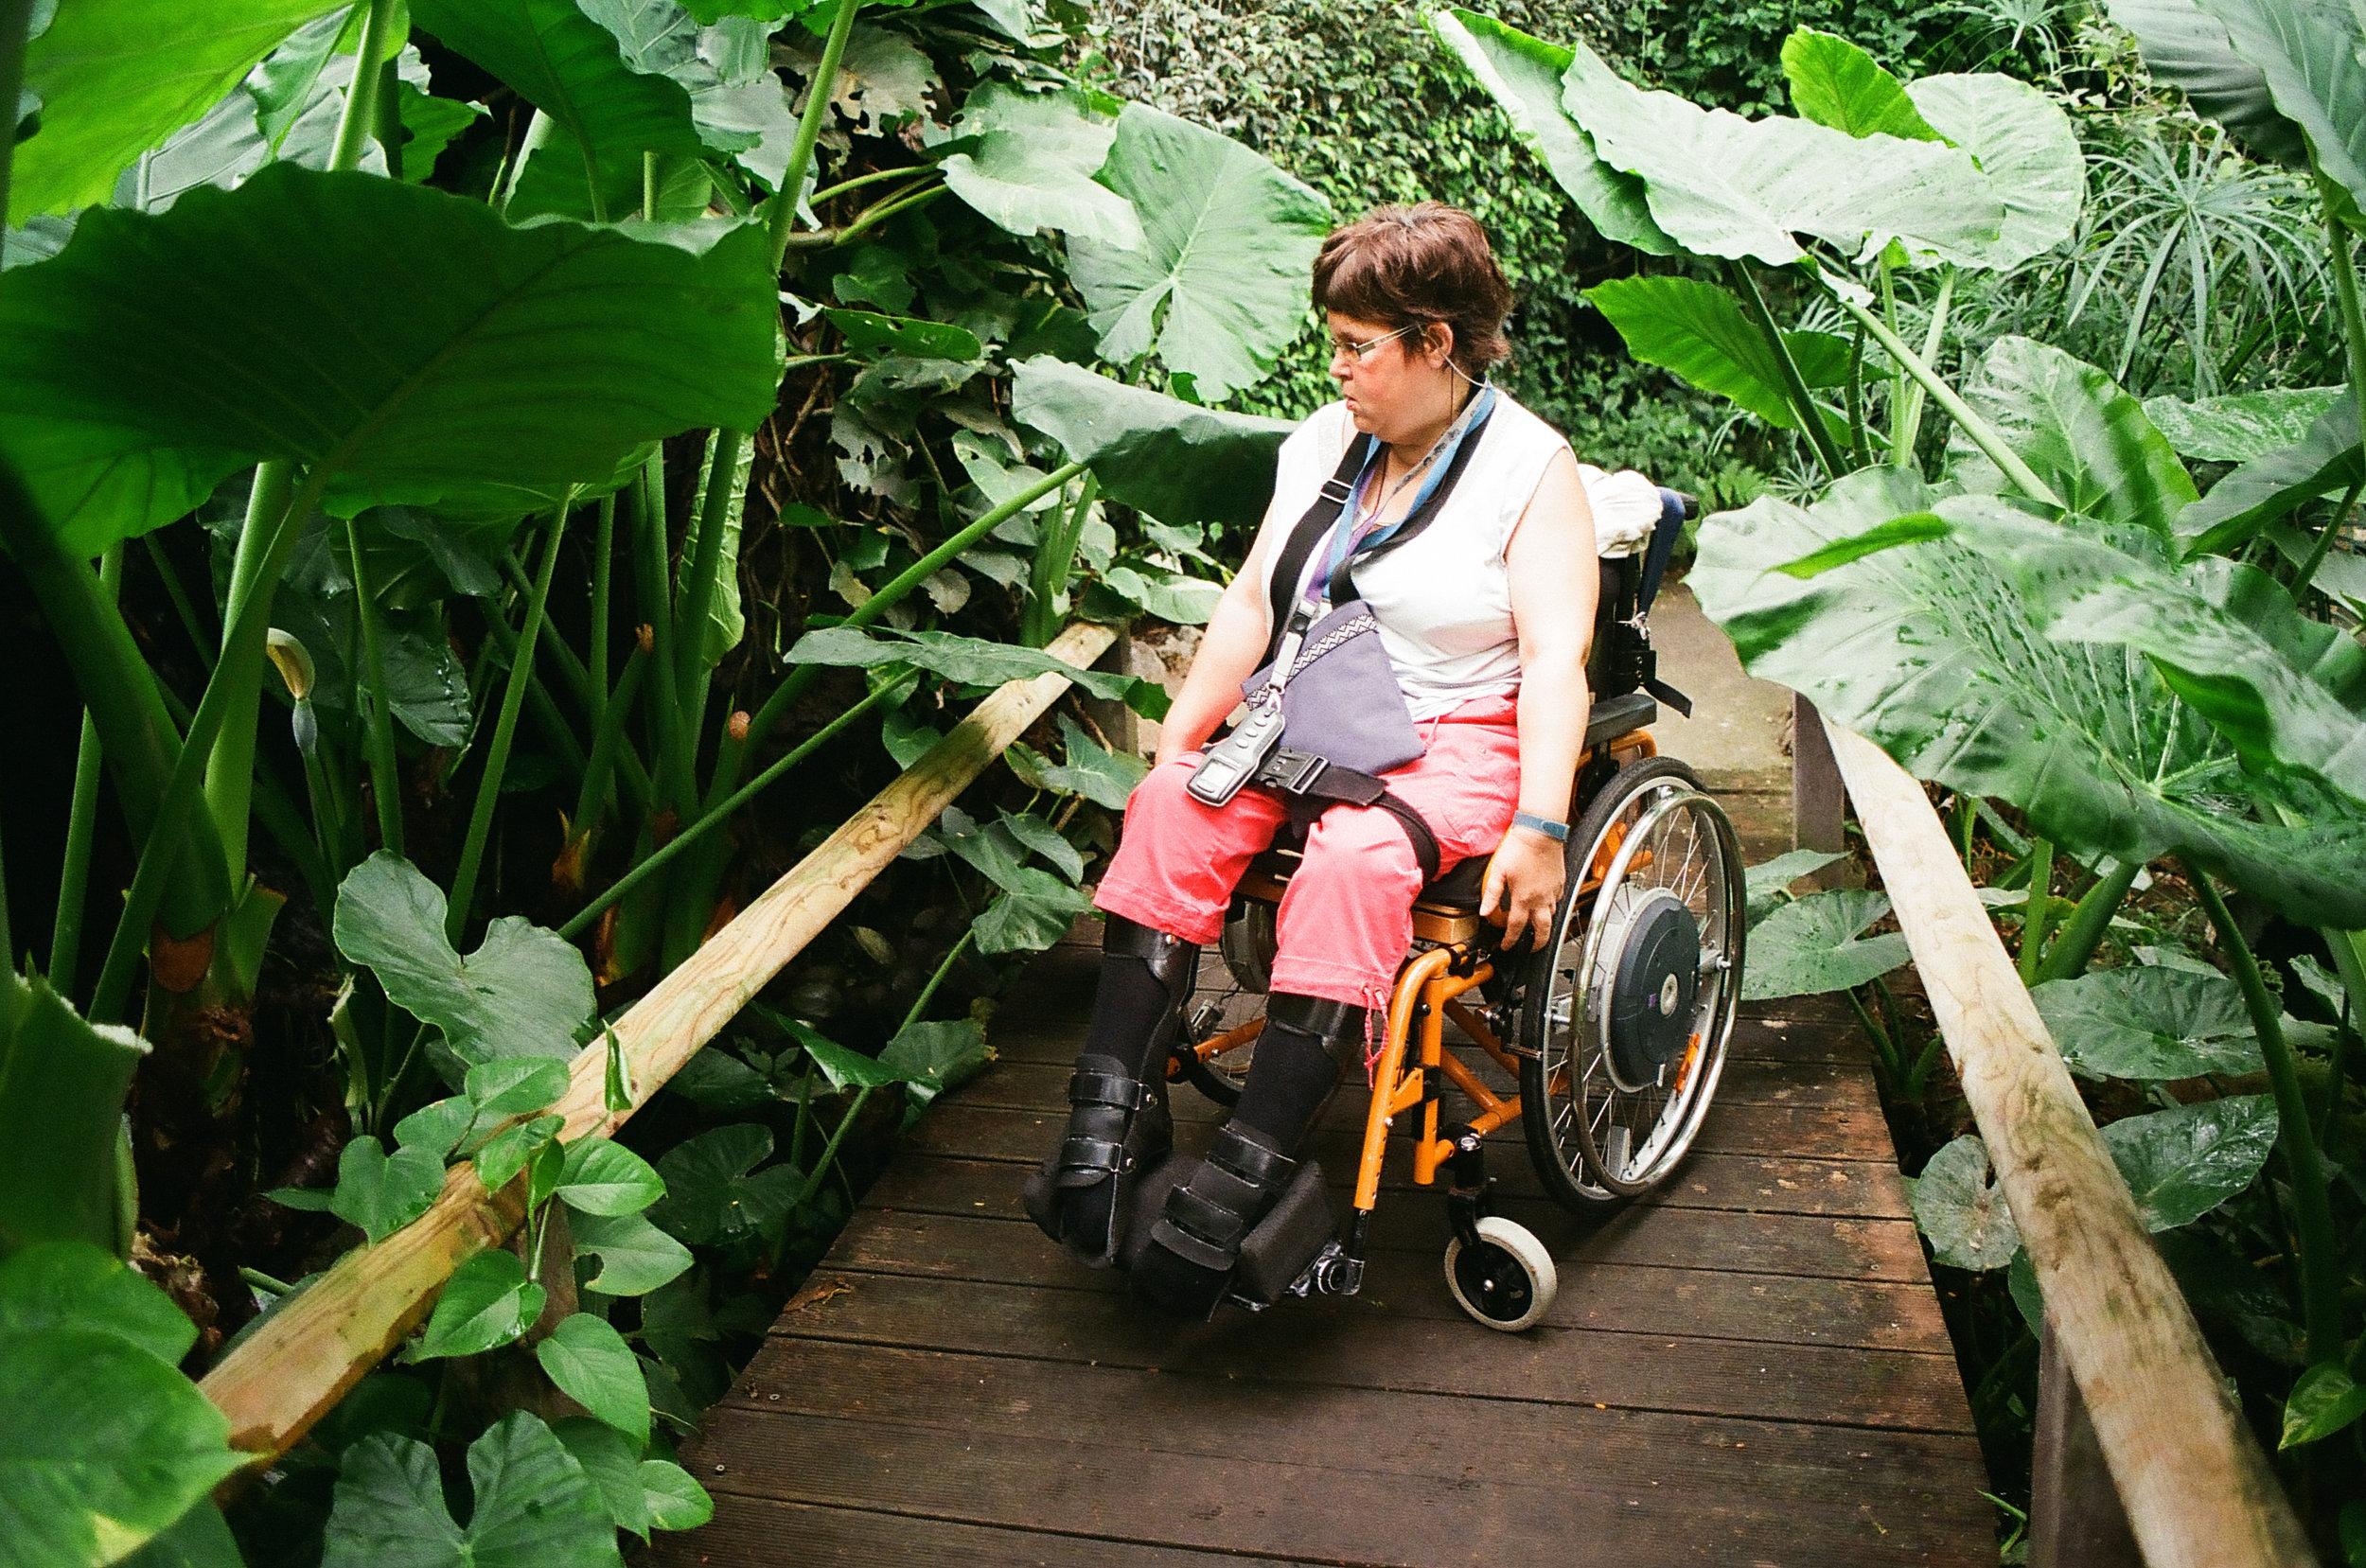 03082017-0011_9+foyer handicap best 2017.JPG